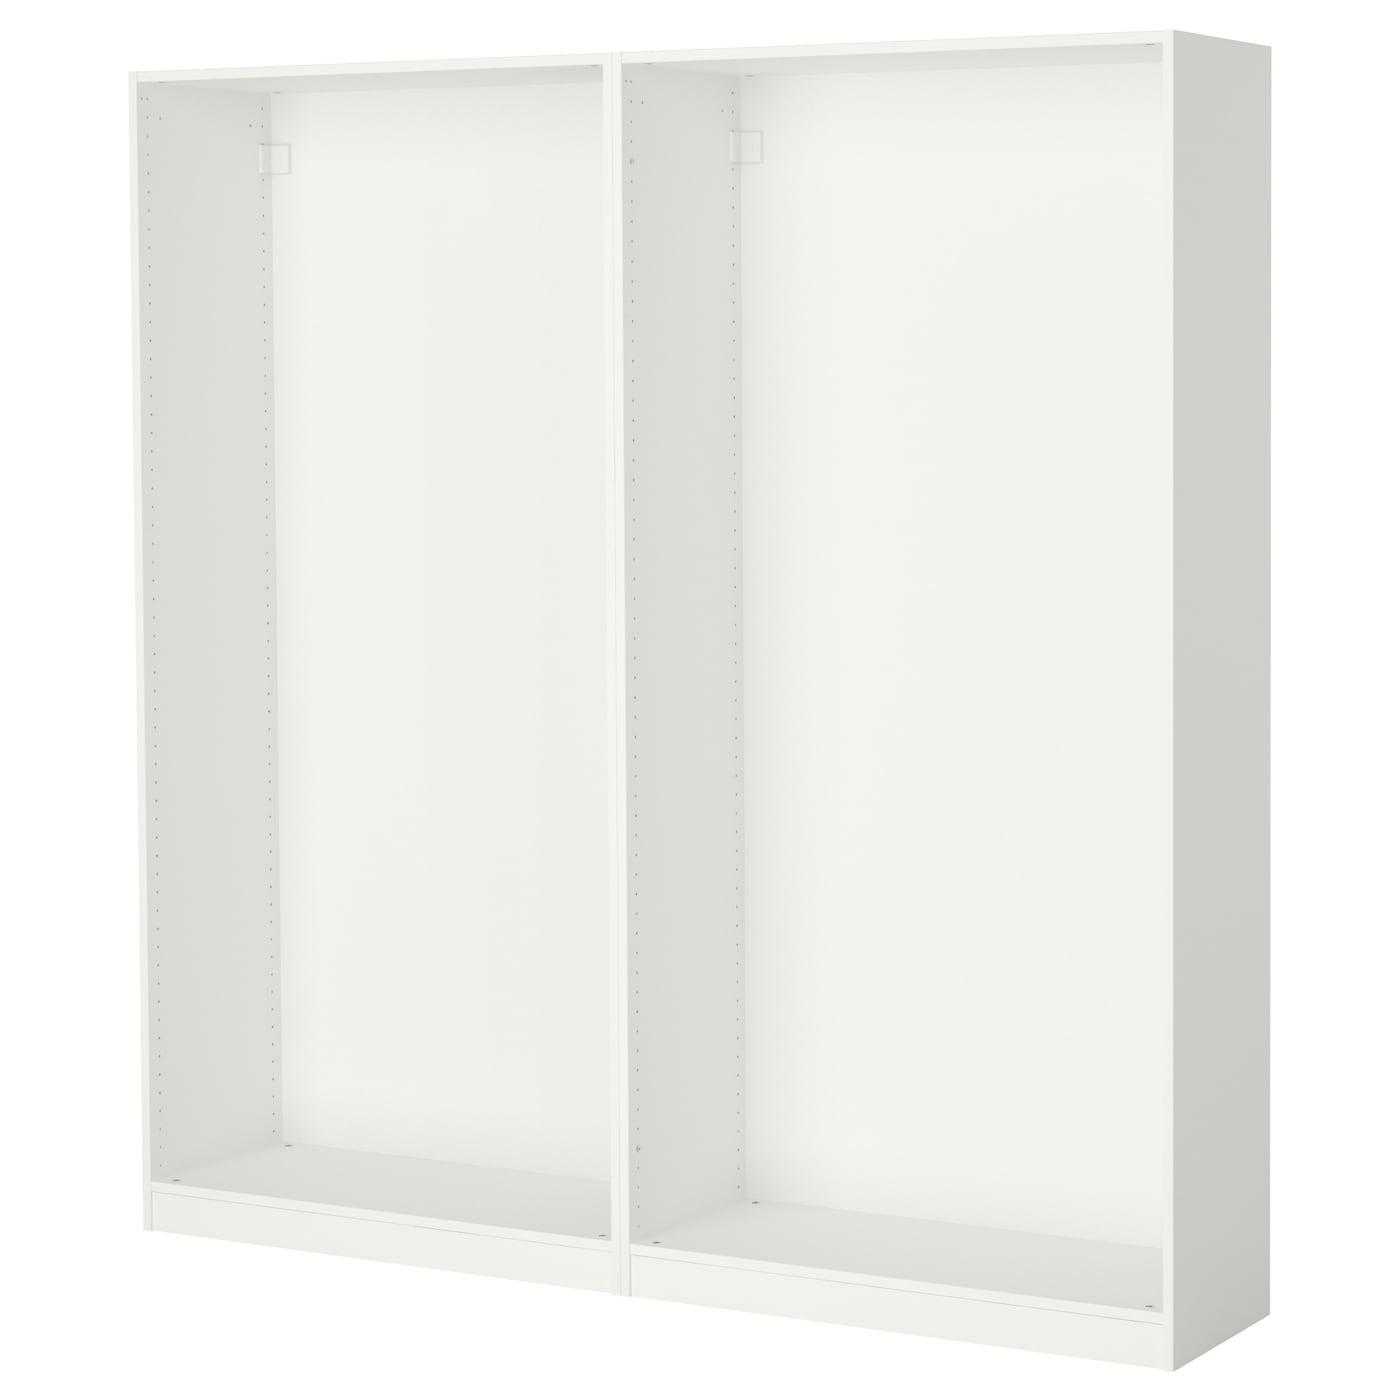 pax 2 caissons armoire blanc 200 x 35 x 201 cm ikea. Black Bedroom Furniture Sets. Home Design Ideas